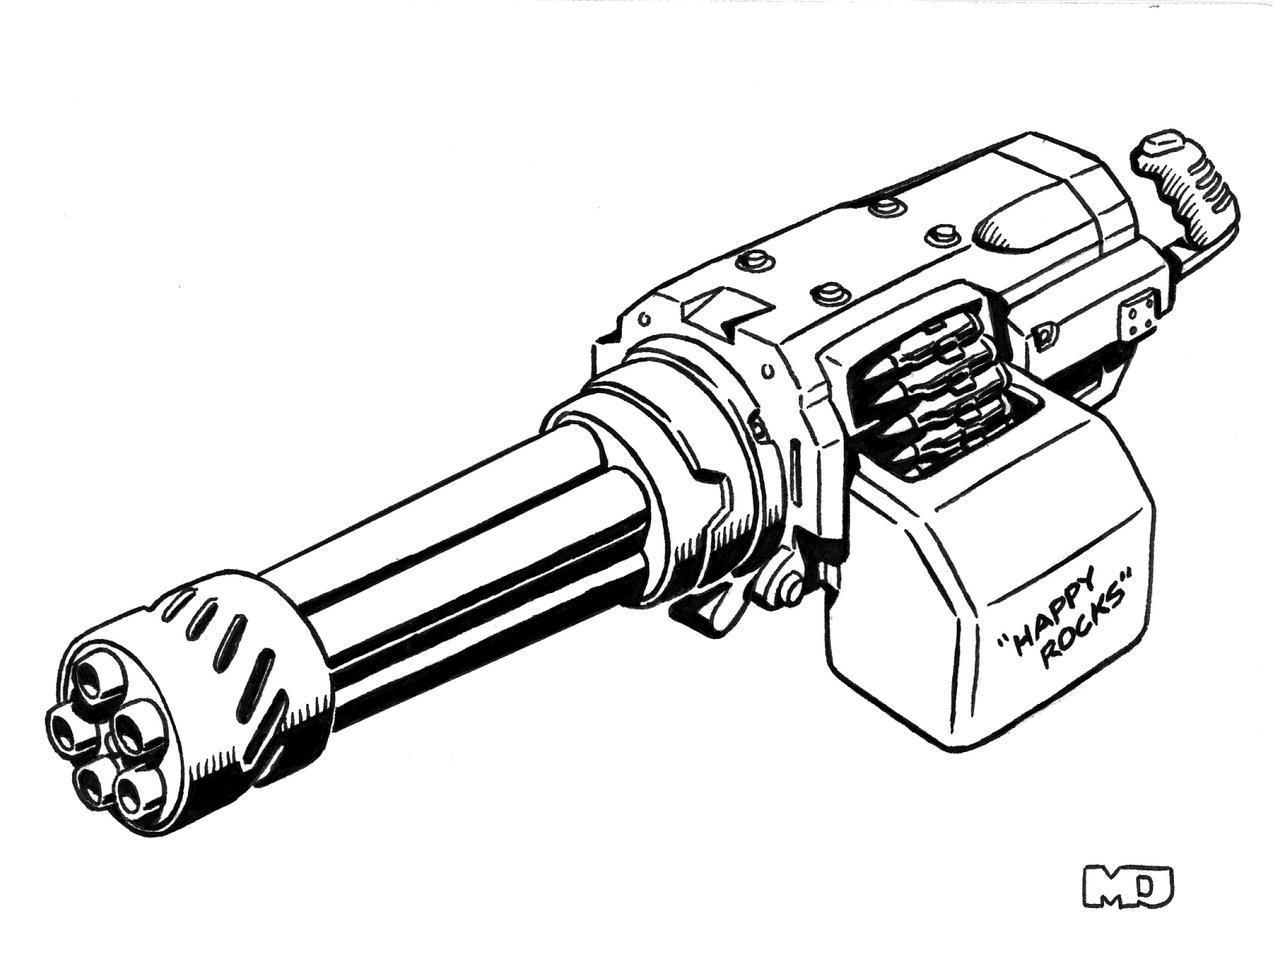 m16 coloring pages - minigun gun drawings sketch coloring page